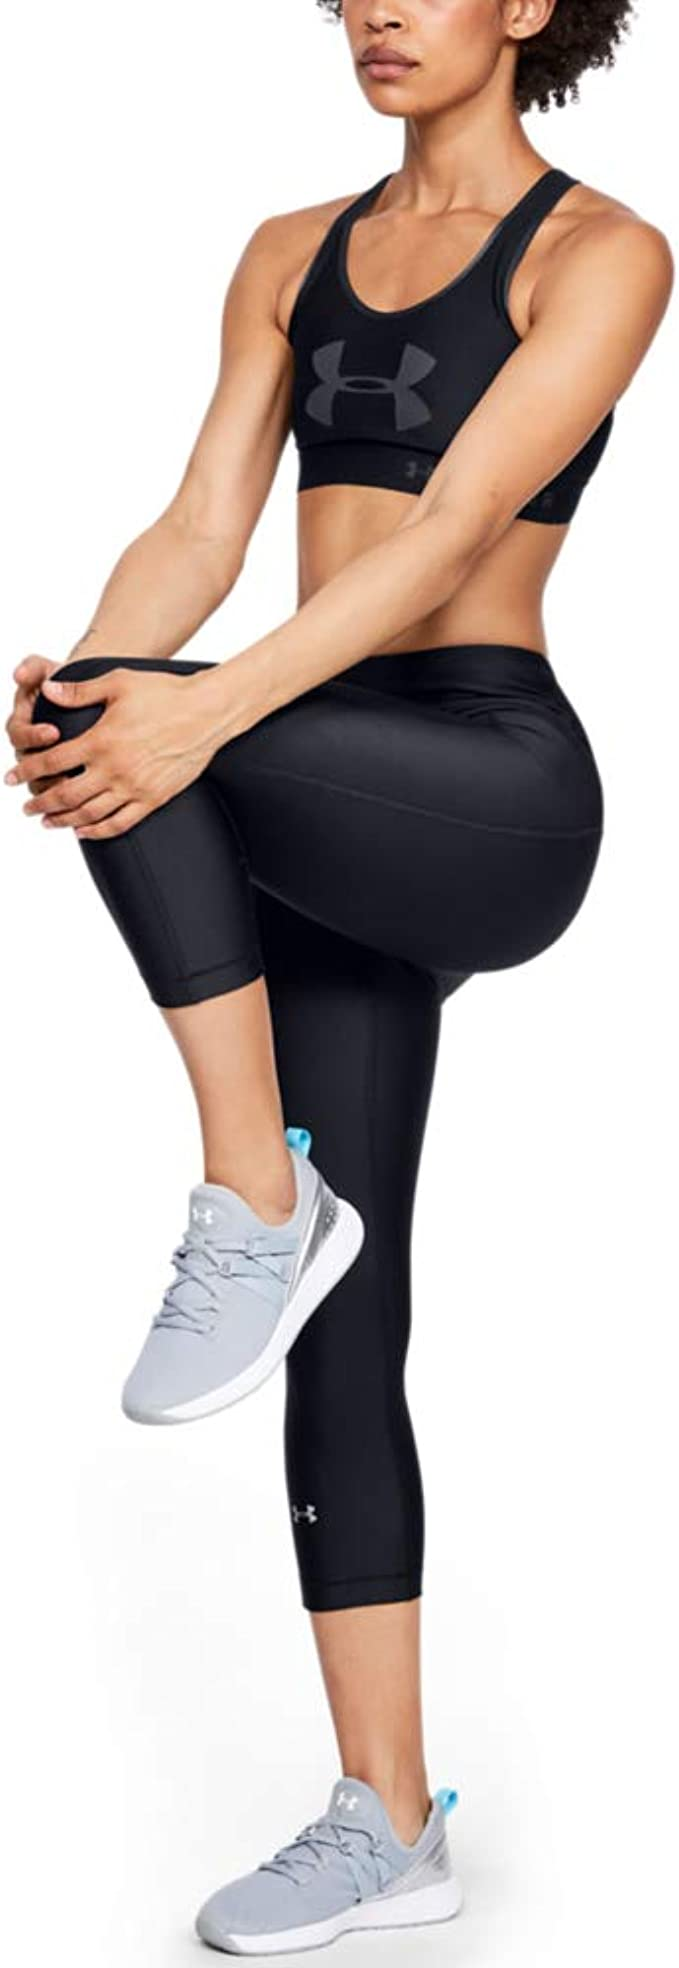 Under Armour HeatGear Womens 3//4 Tights Black Gym Running Sports Training Capri